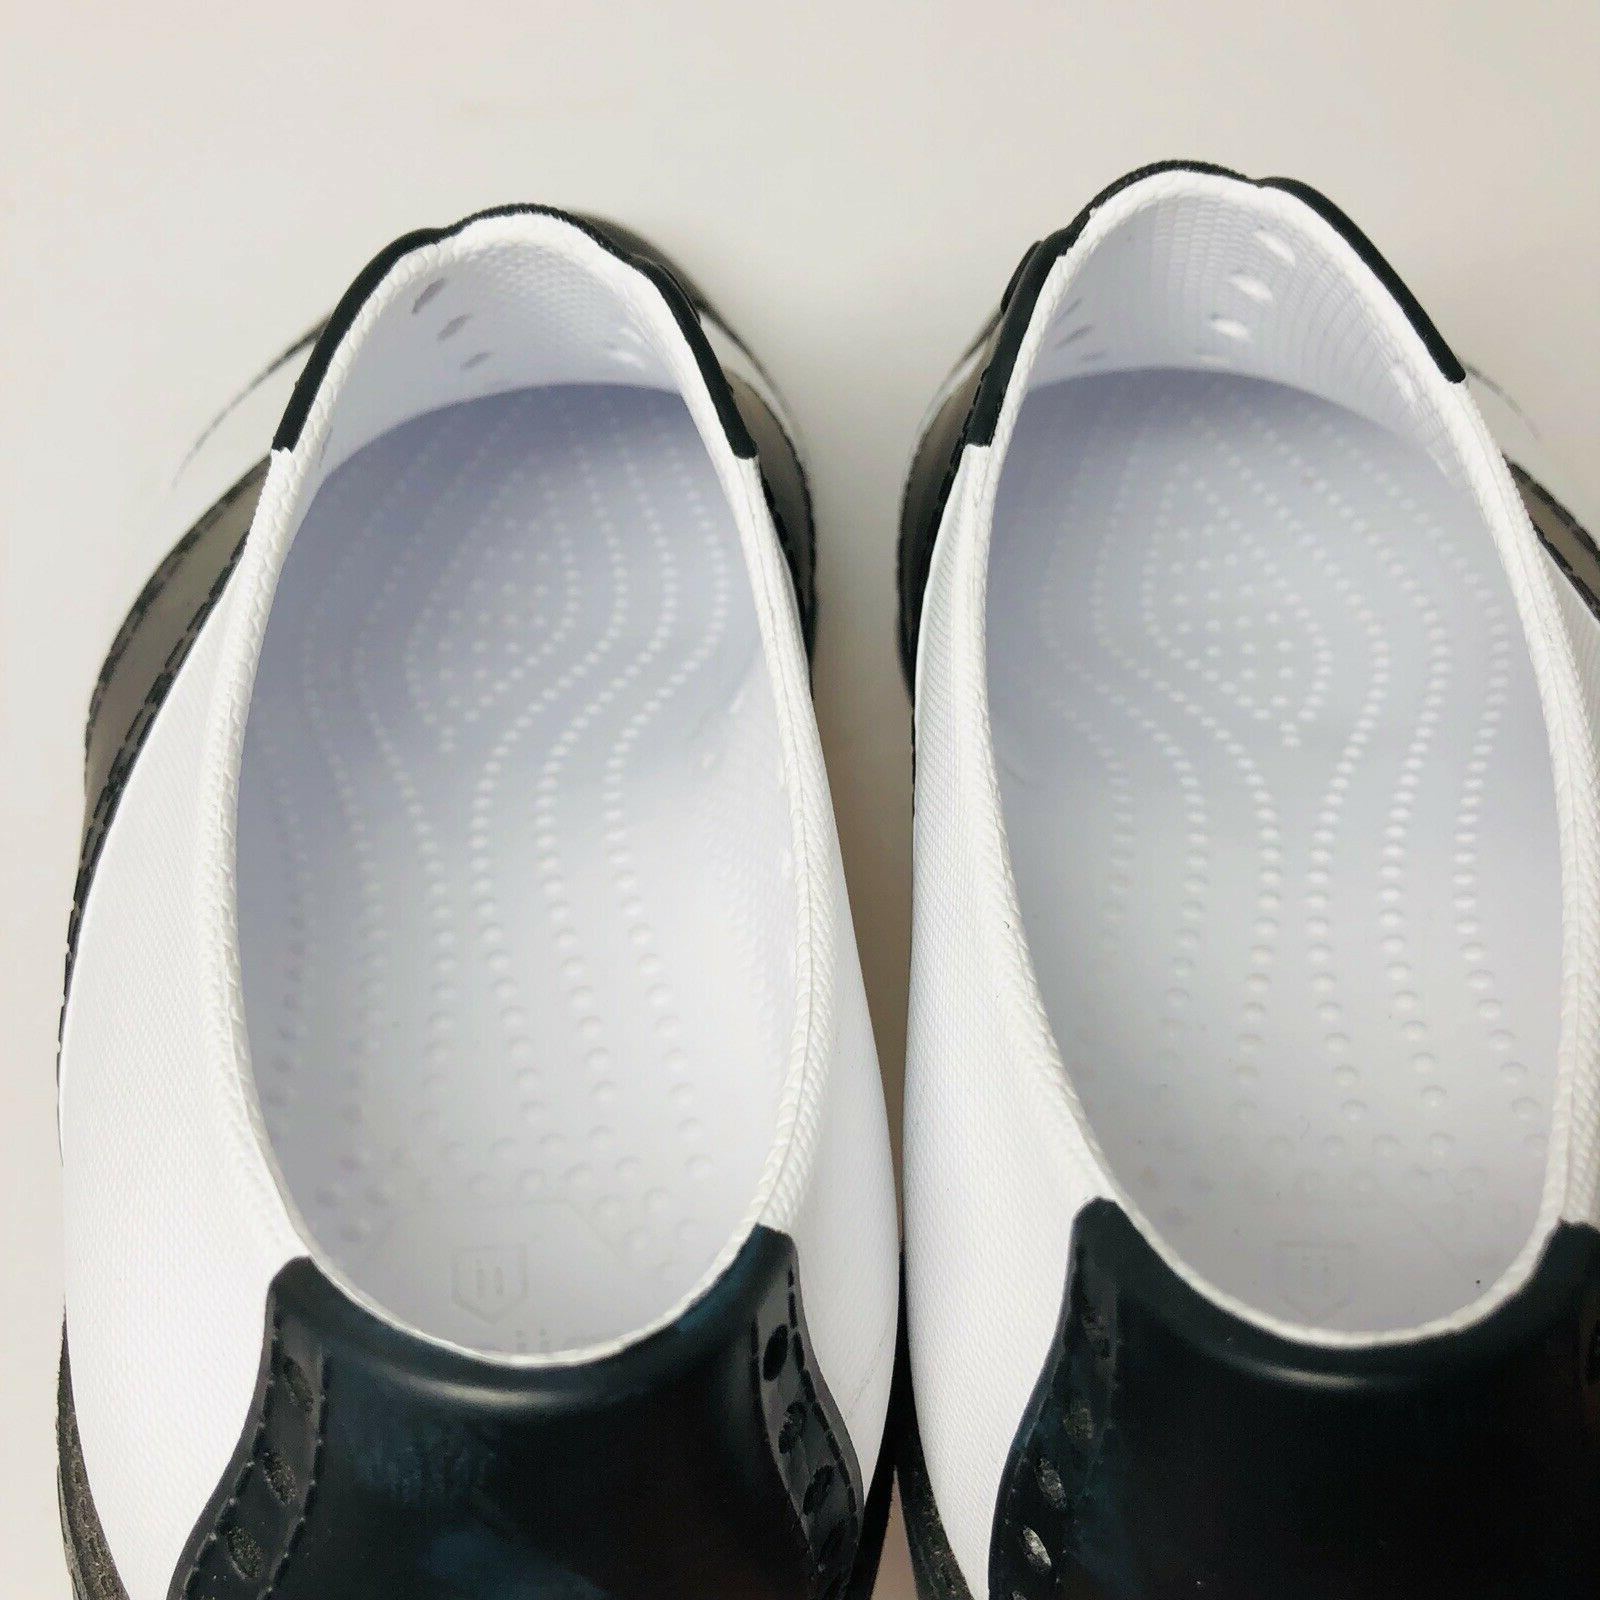 Biion Golf Shoes Classics BCL-1004 Men 9 Saddle